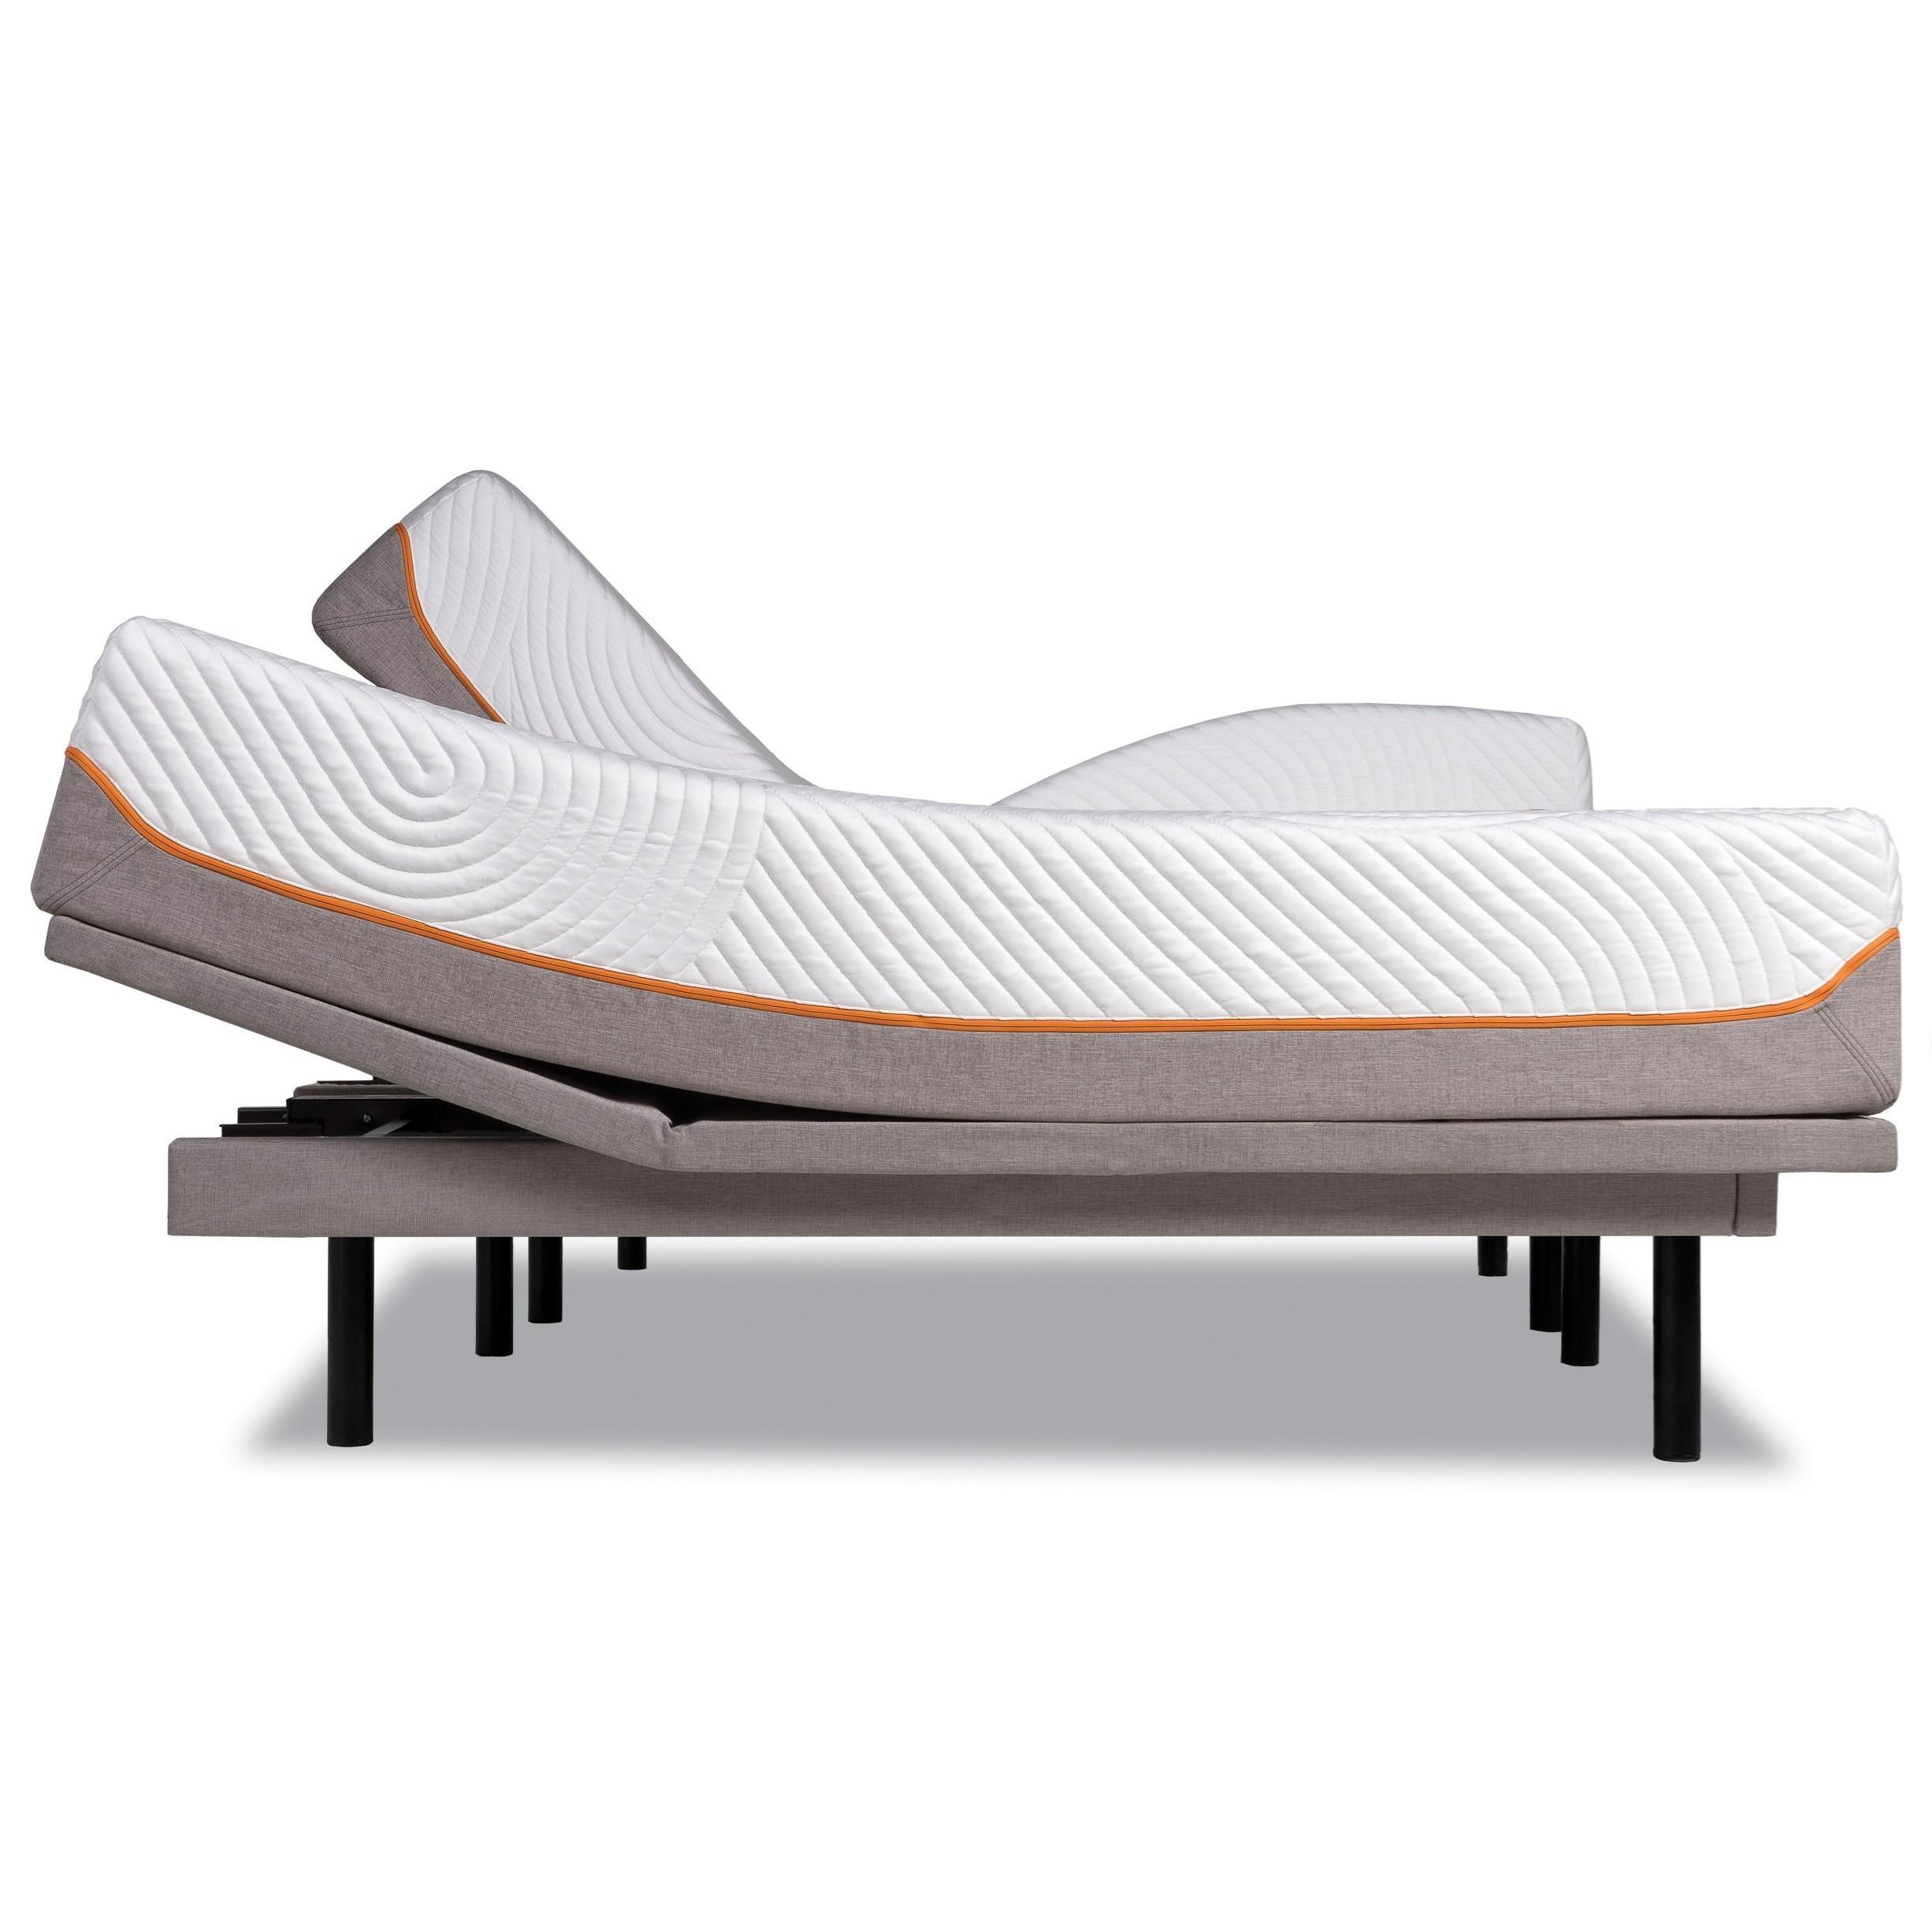 Tempur-Pedic® TEMPUR-Contour Rhapsody Luxe Cal King Medium Firm Mattress, Adj Set - Item Number: 10258180+2x25289290